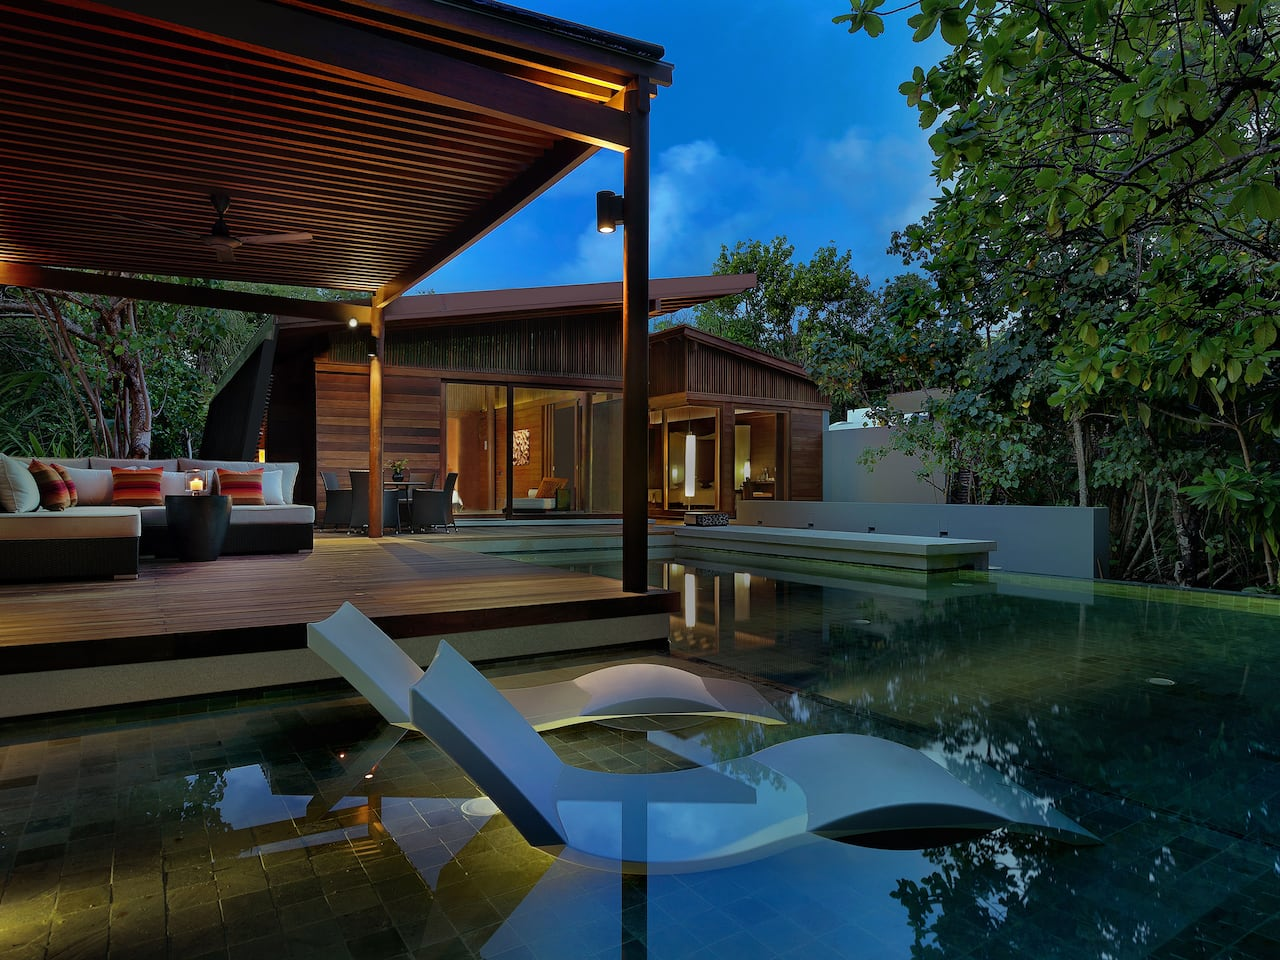 pool villa outdoor evening